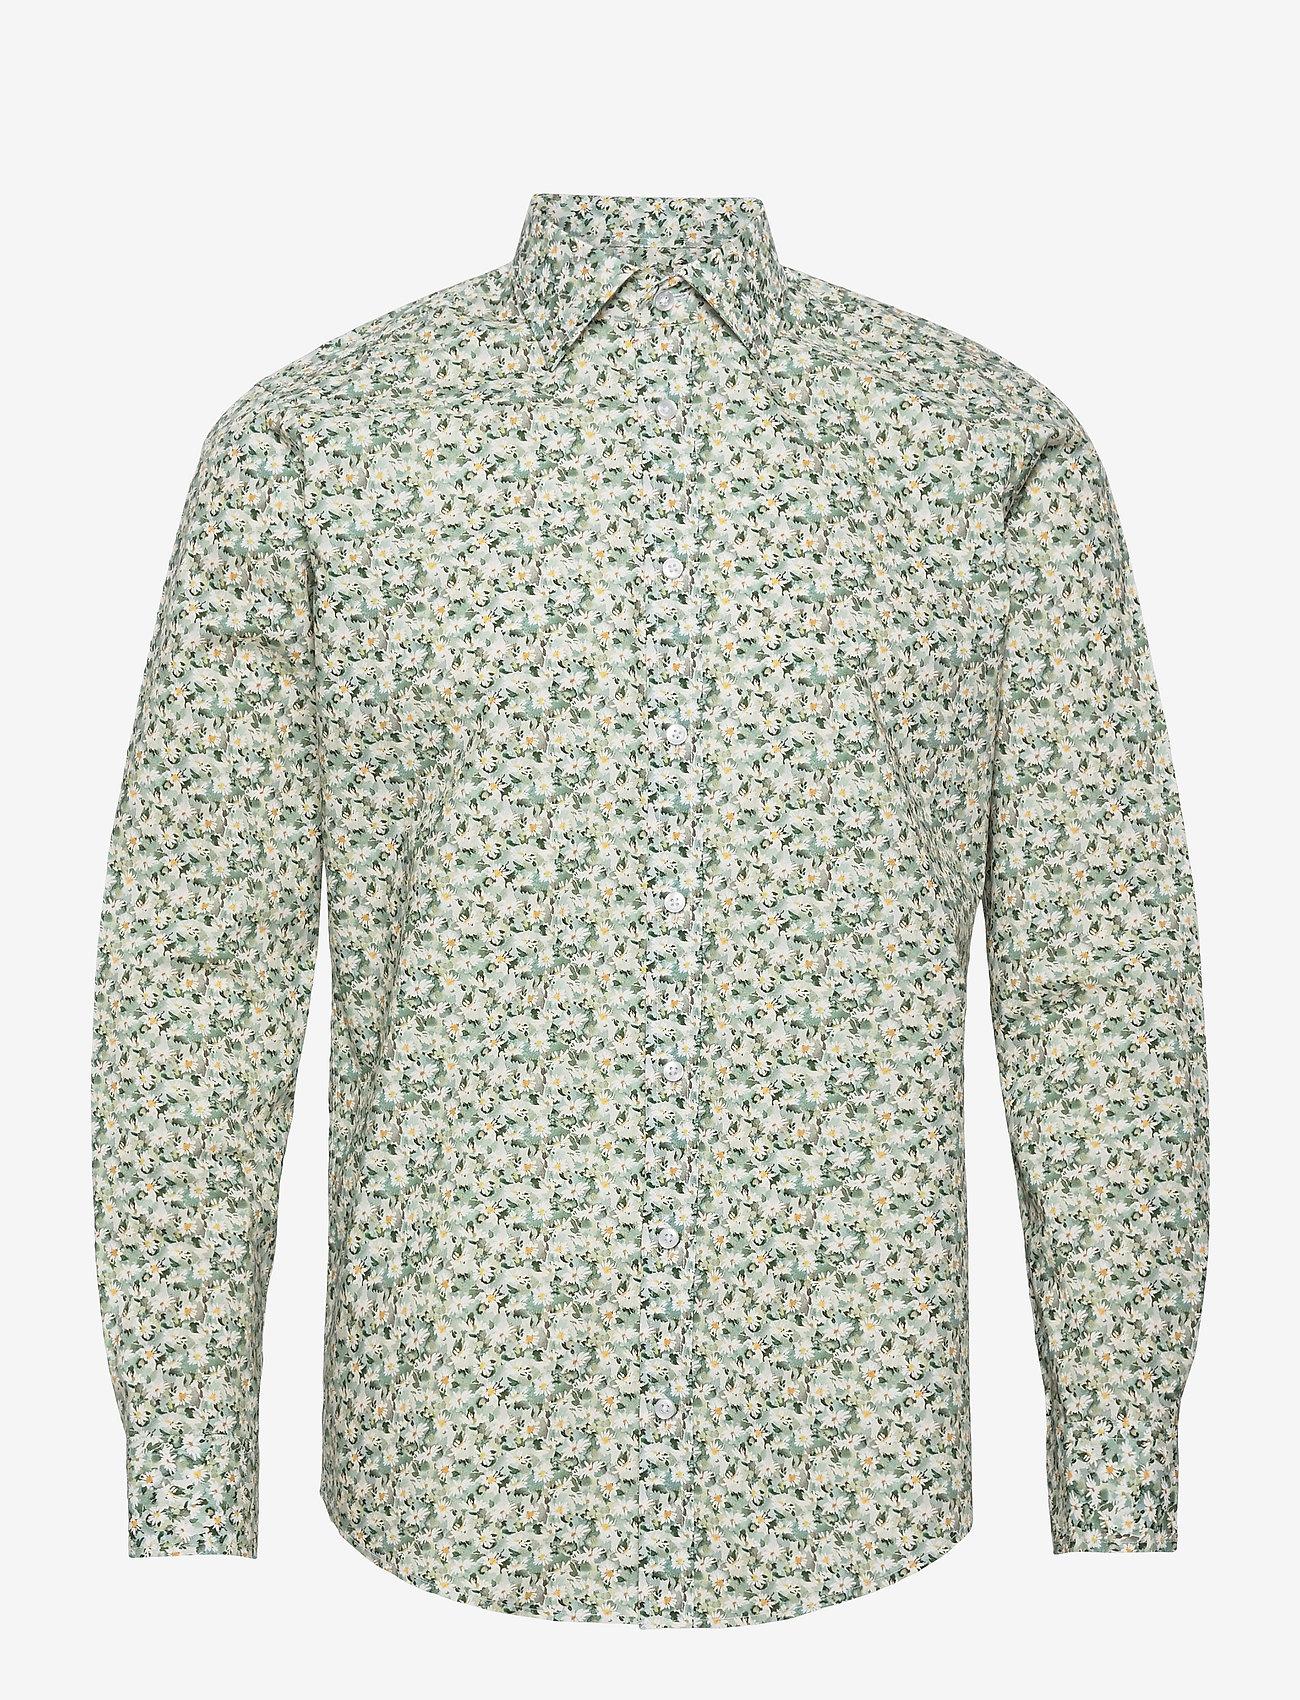 Bosweel Shirts Est. 1937 - White flowers in green - chemises d'affaires - green - 0